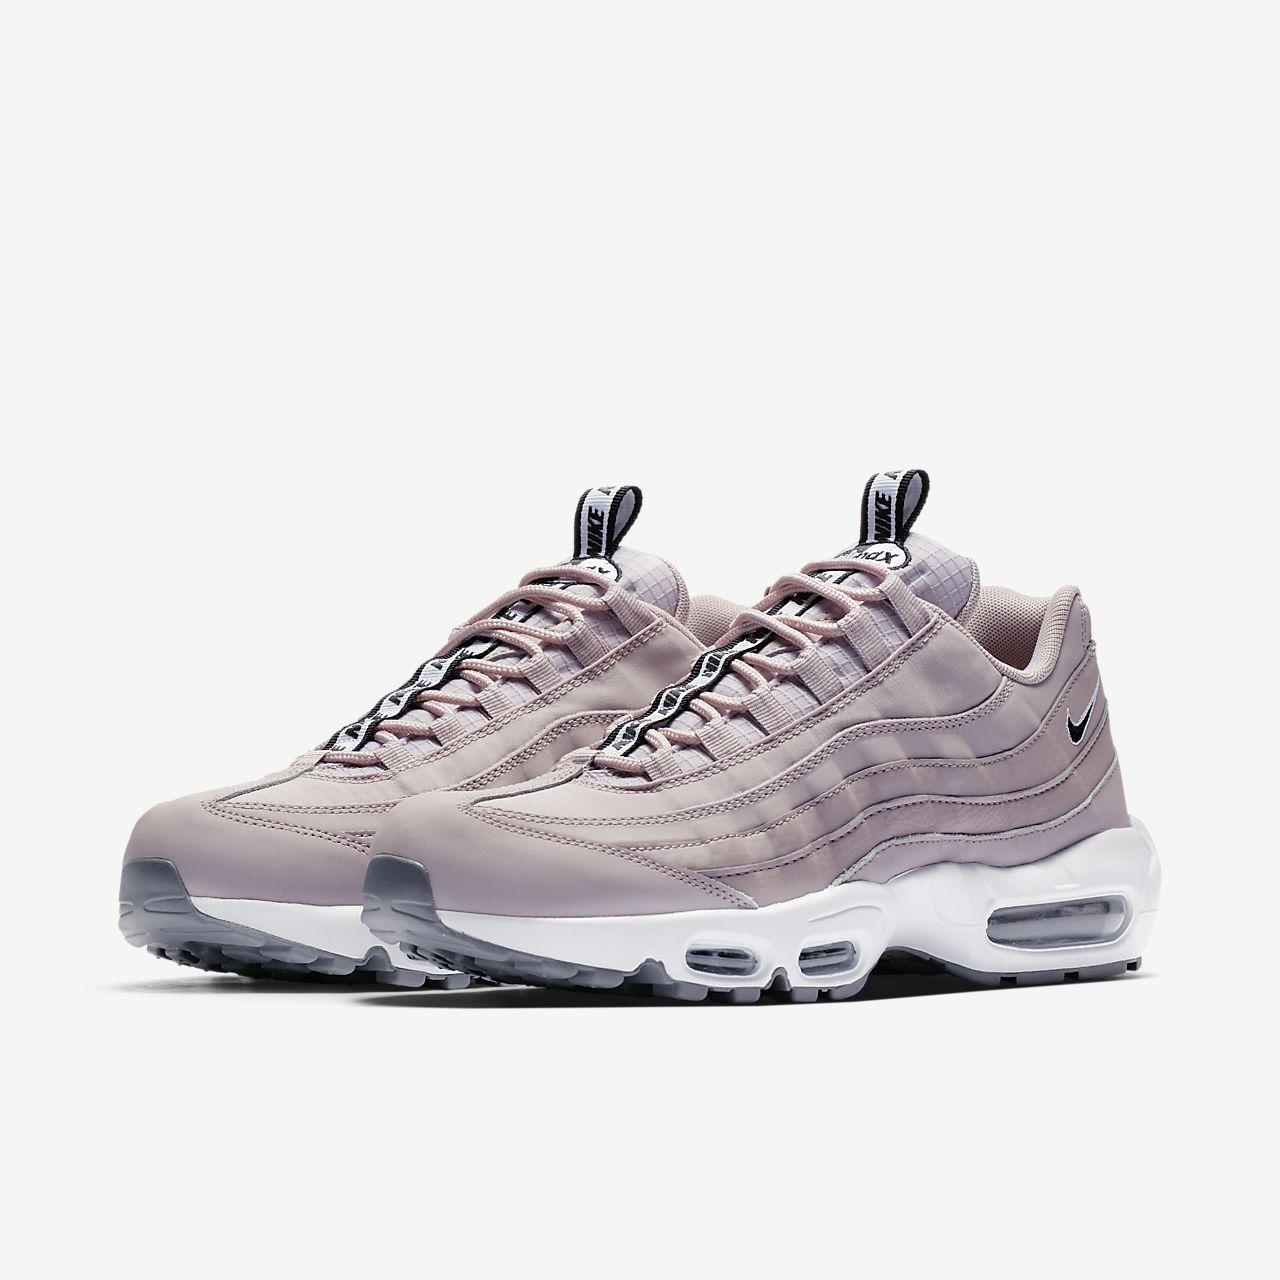 online retailer e94a6 97cbc Sneaker Release Alert – Nike Air Max 95 Tab (Particle Rose) –  mensfashionneeds